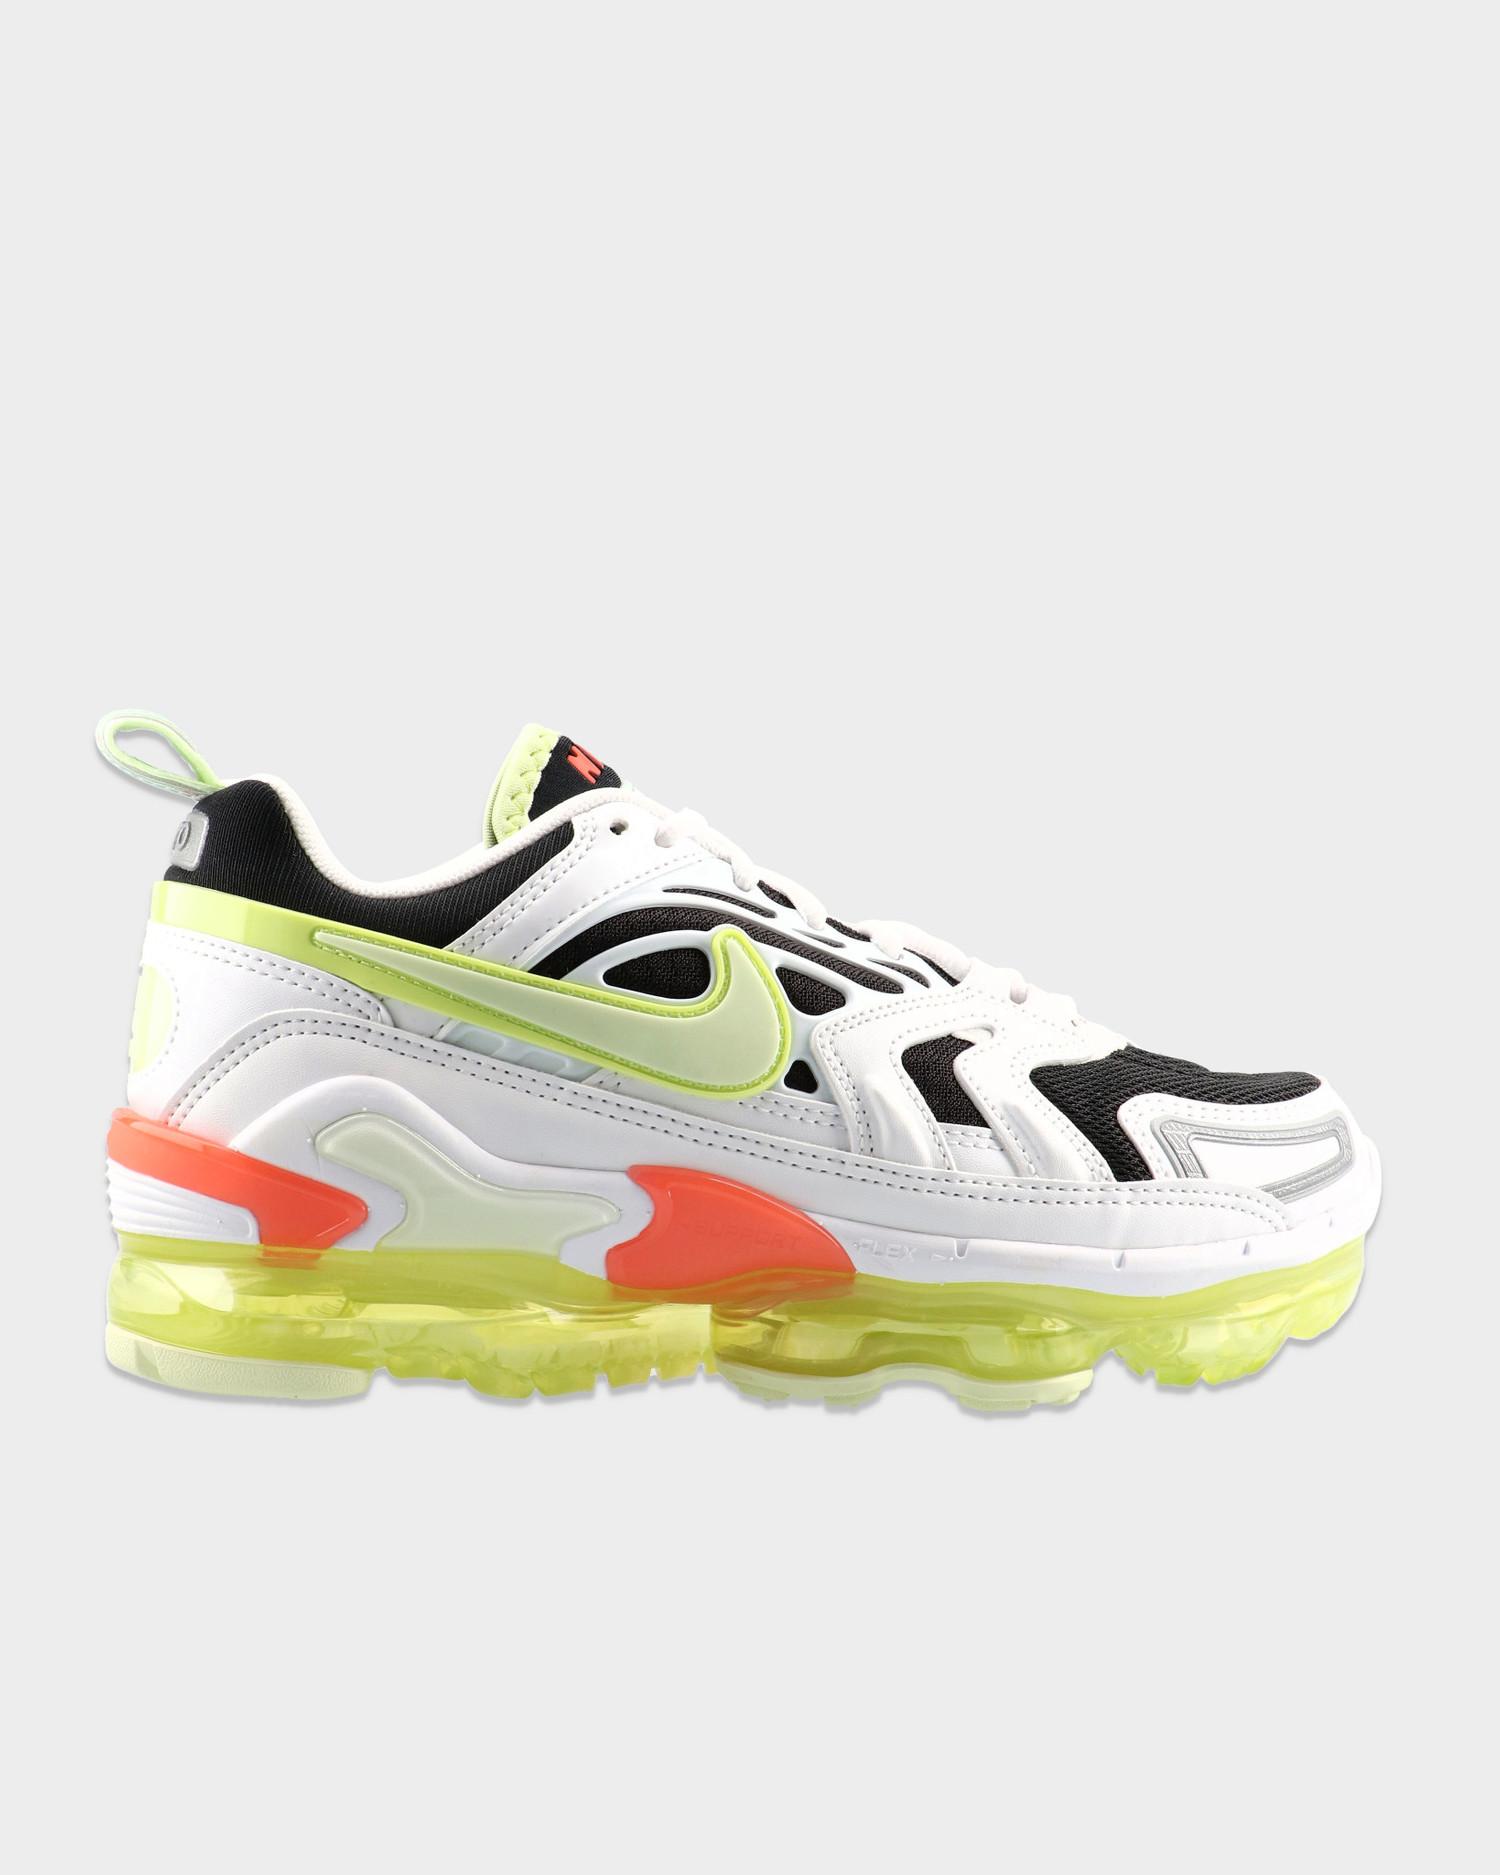 Nike Wmns Air VaporMax EVO White/Lime Ice/Black-Lemon Twist